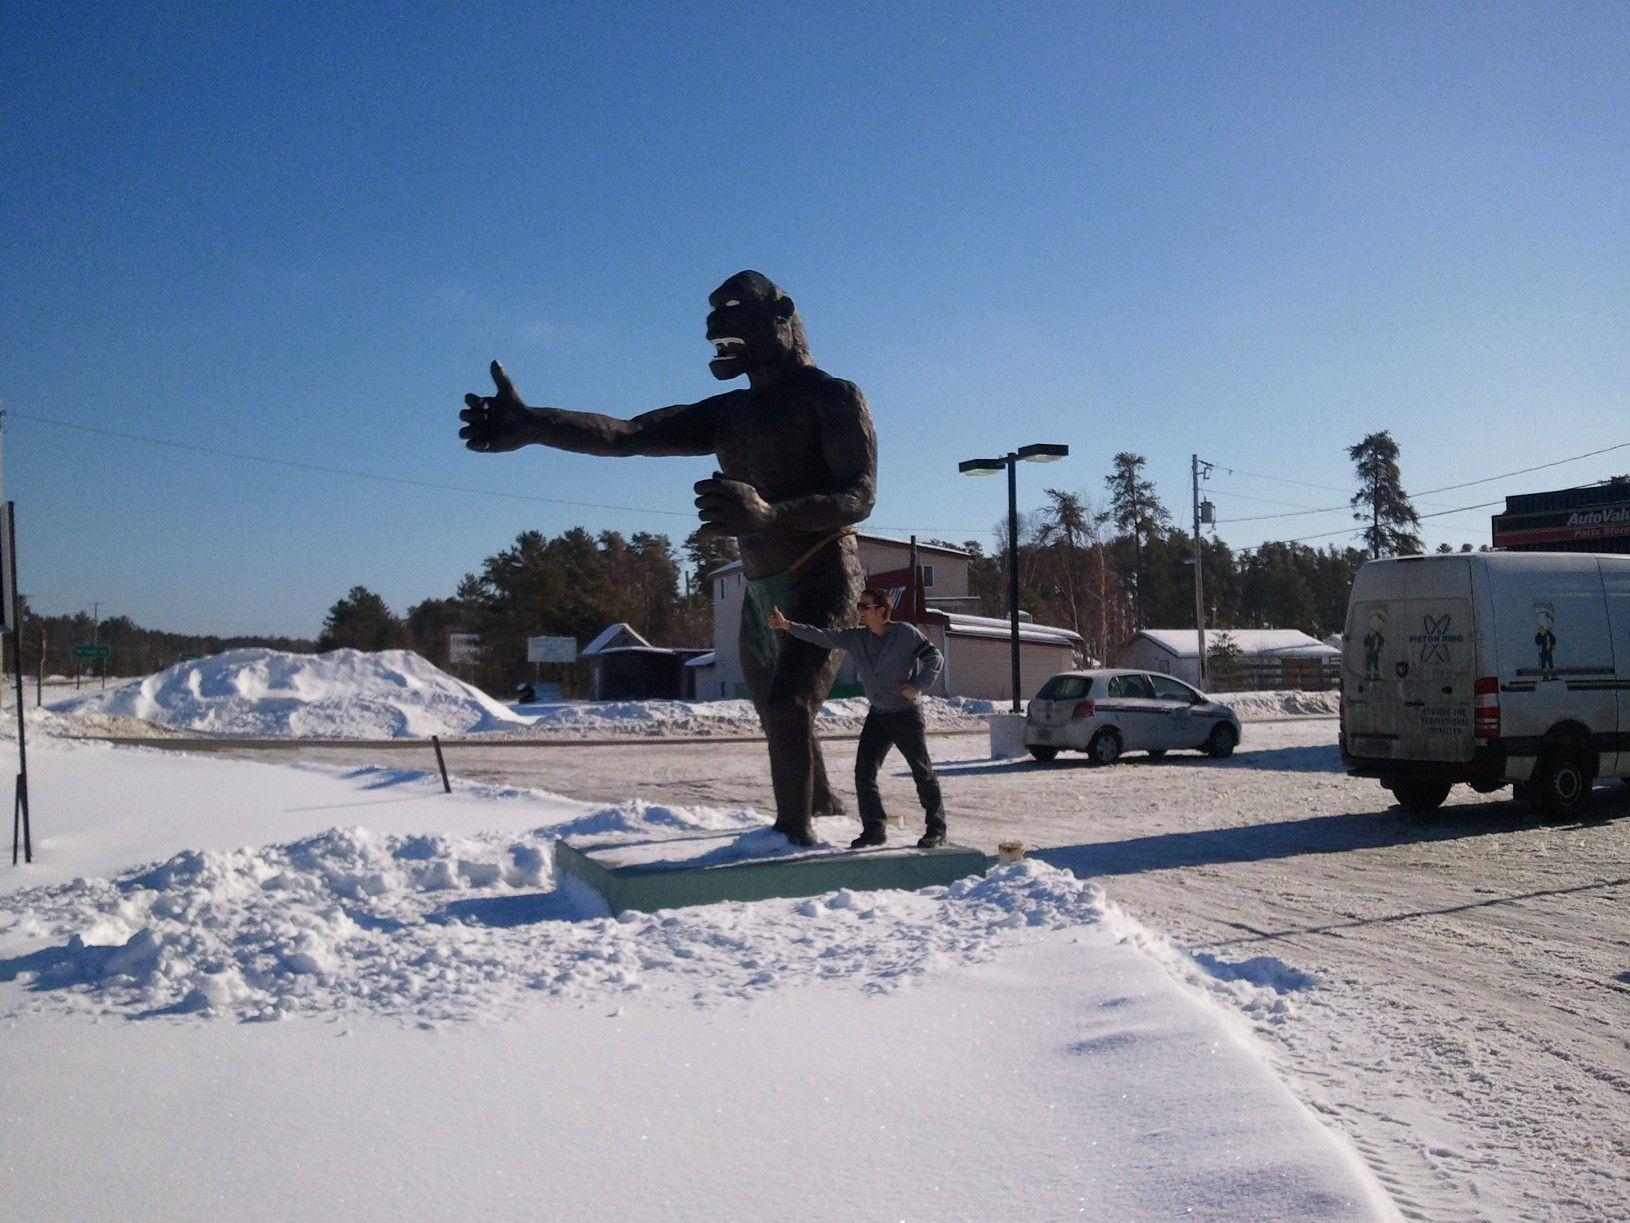 Squatching while passing through Vermillion Bay, Ontario.